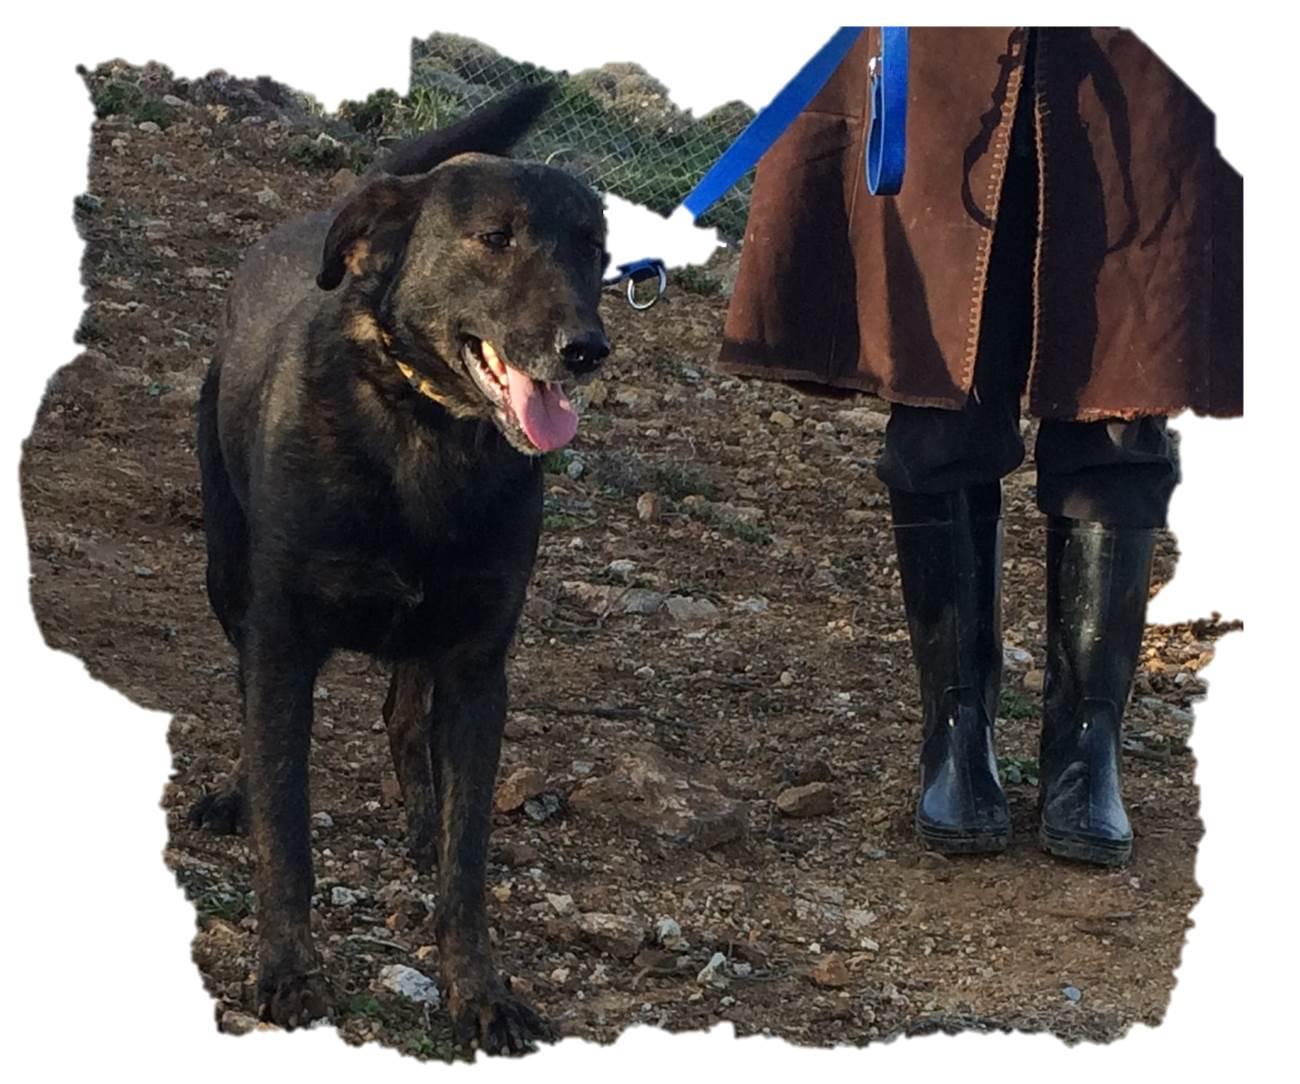 Ilias mix | Mykonos dog rescue and adoption